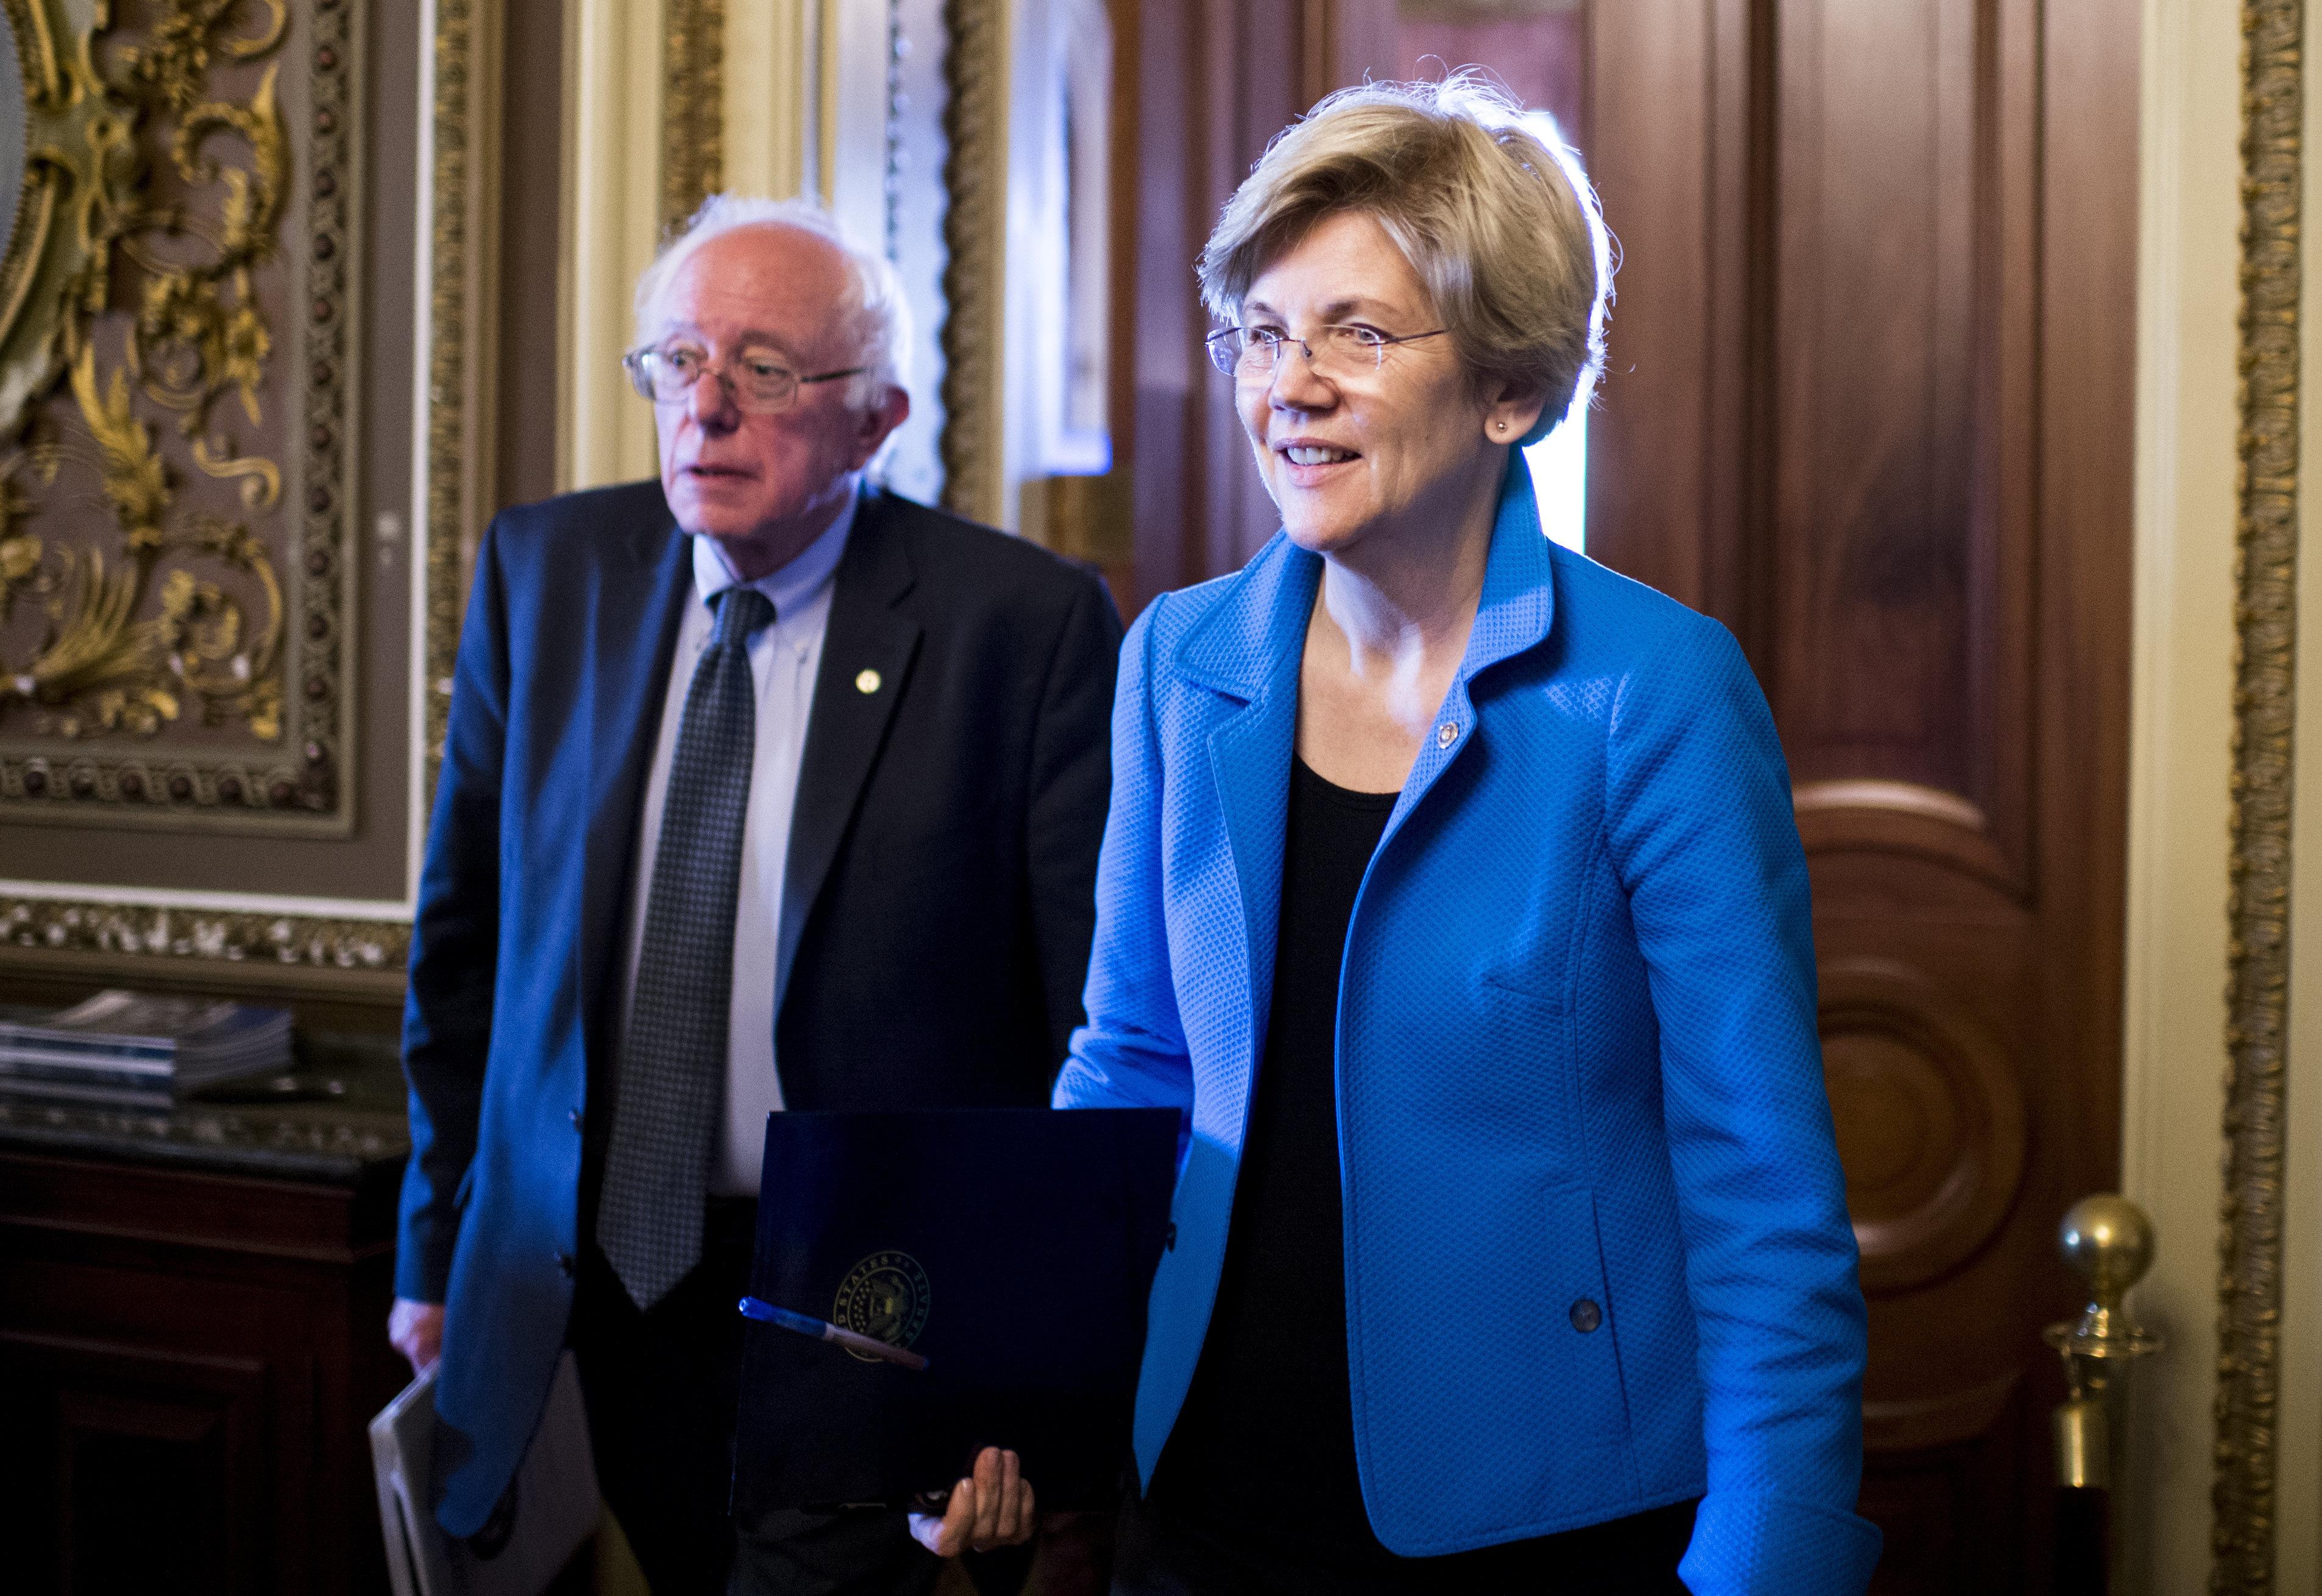 Sens. Elizabeth Warren (D-Mass.) and Bernie Sanders (I-Vt.) hit the trail for Democratic presidential nominee Hillary Clinton